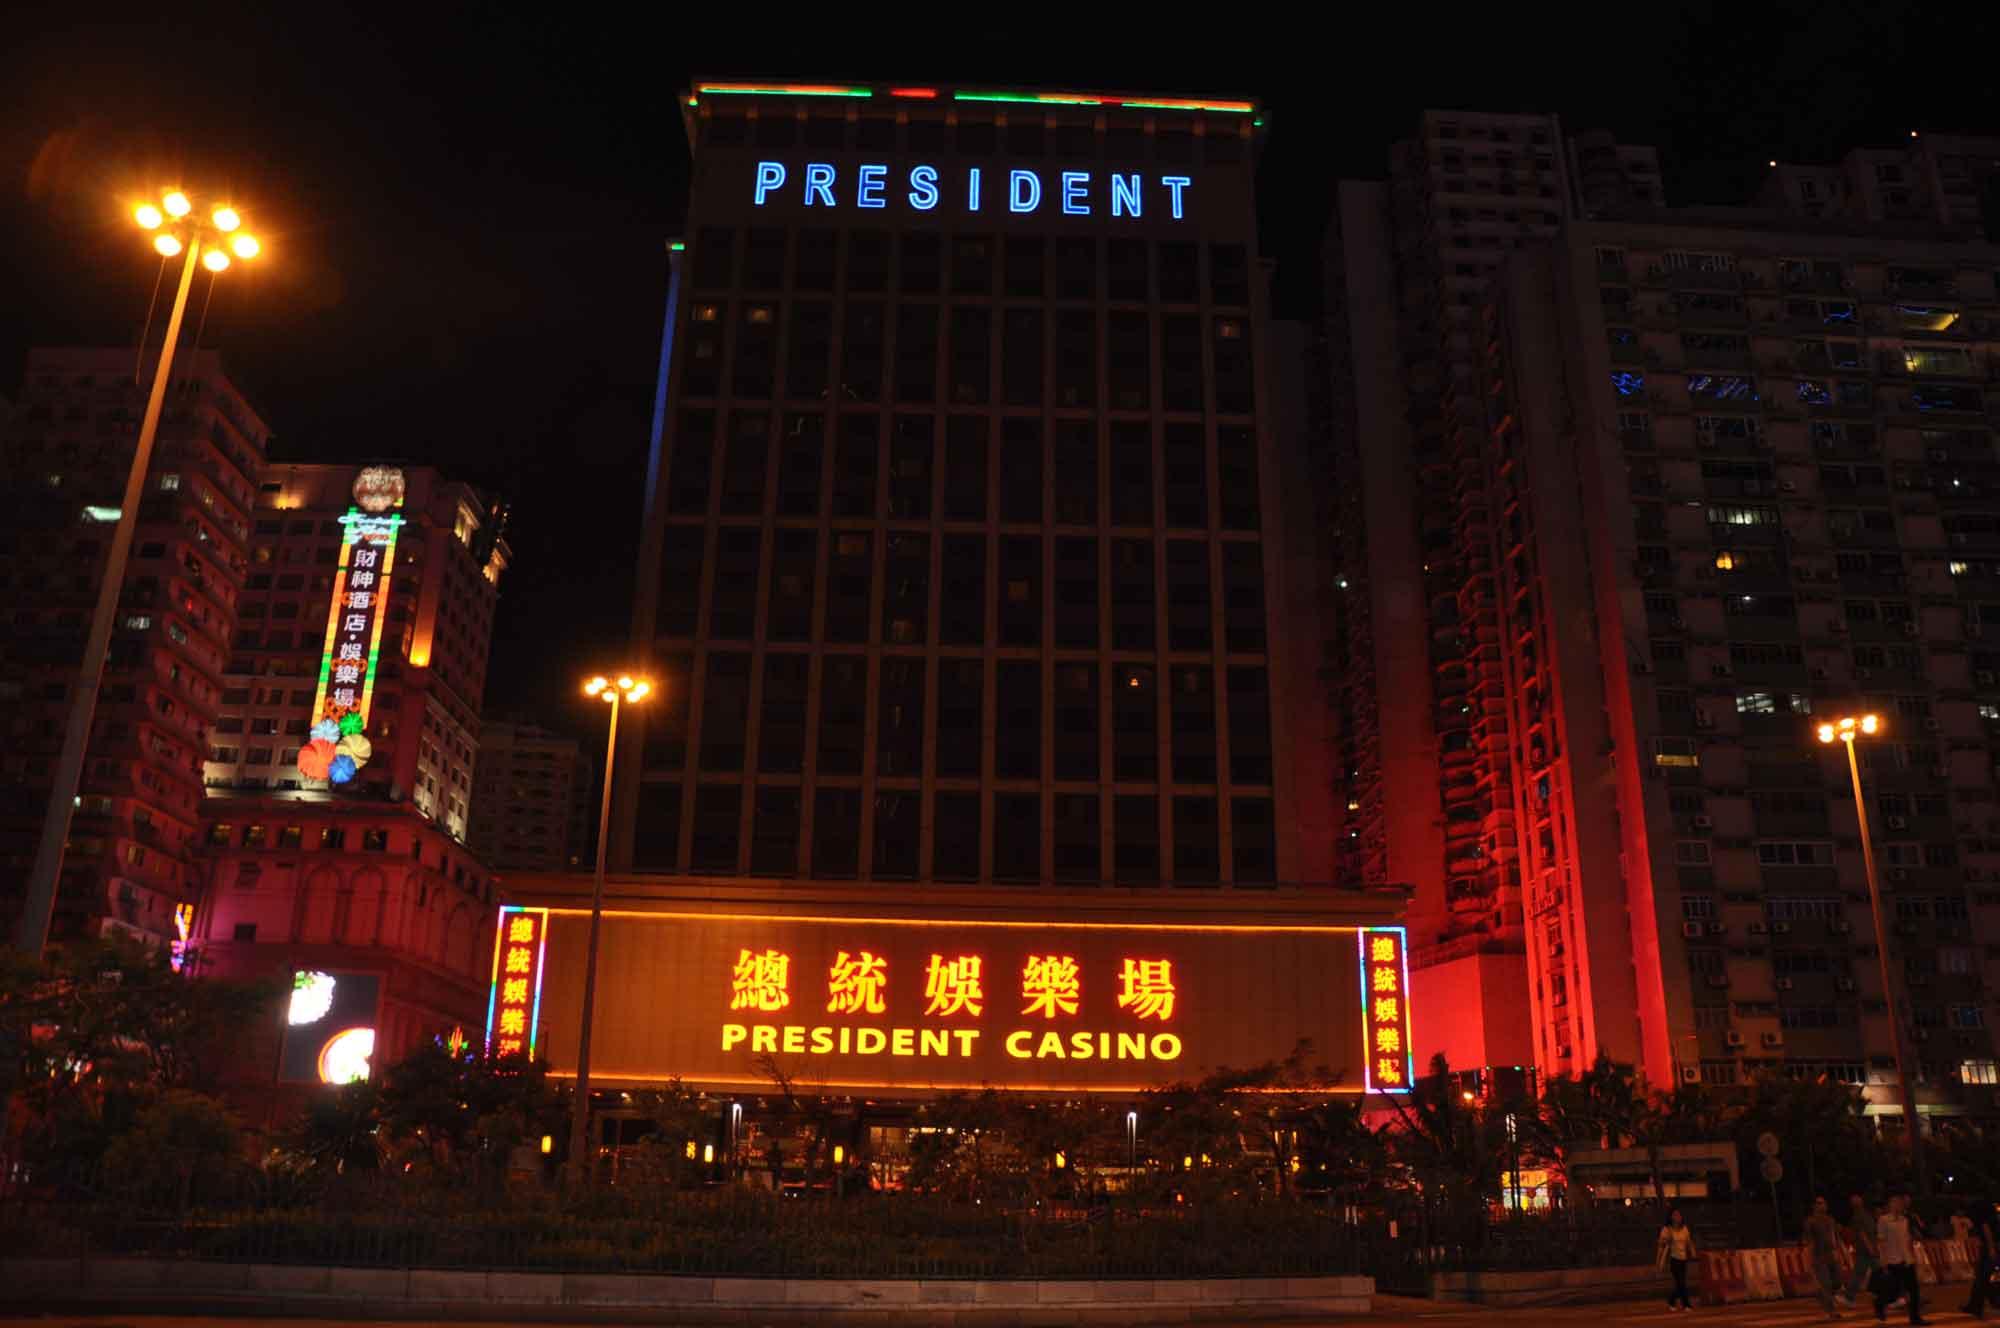 President Casino Macau at night